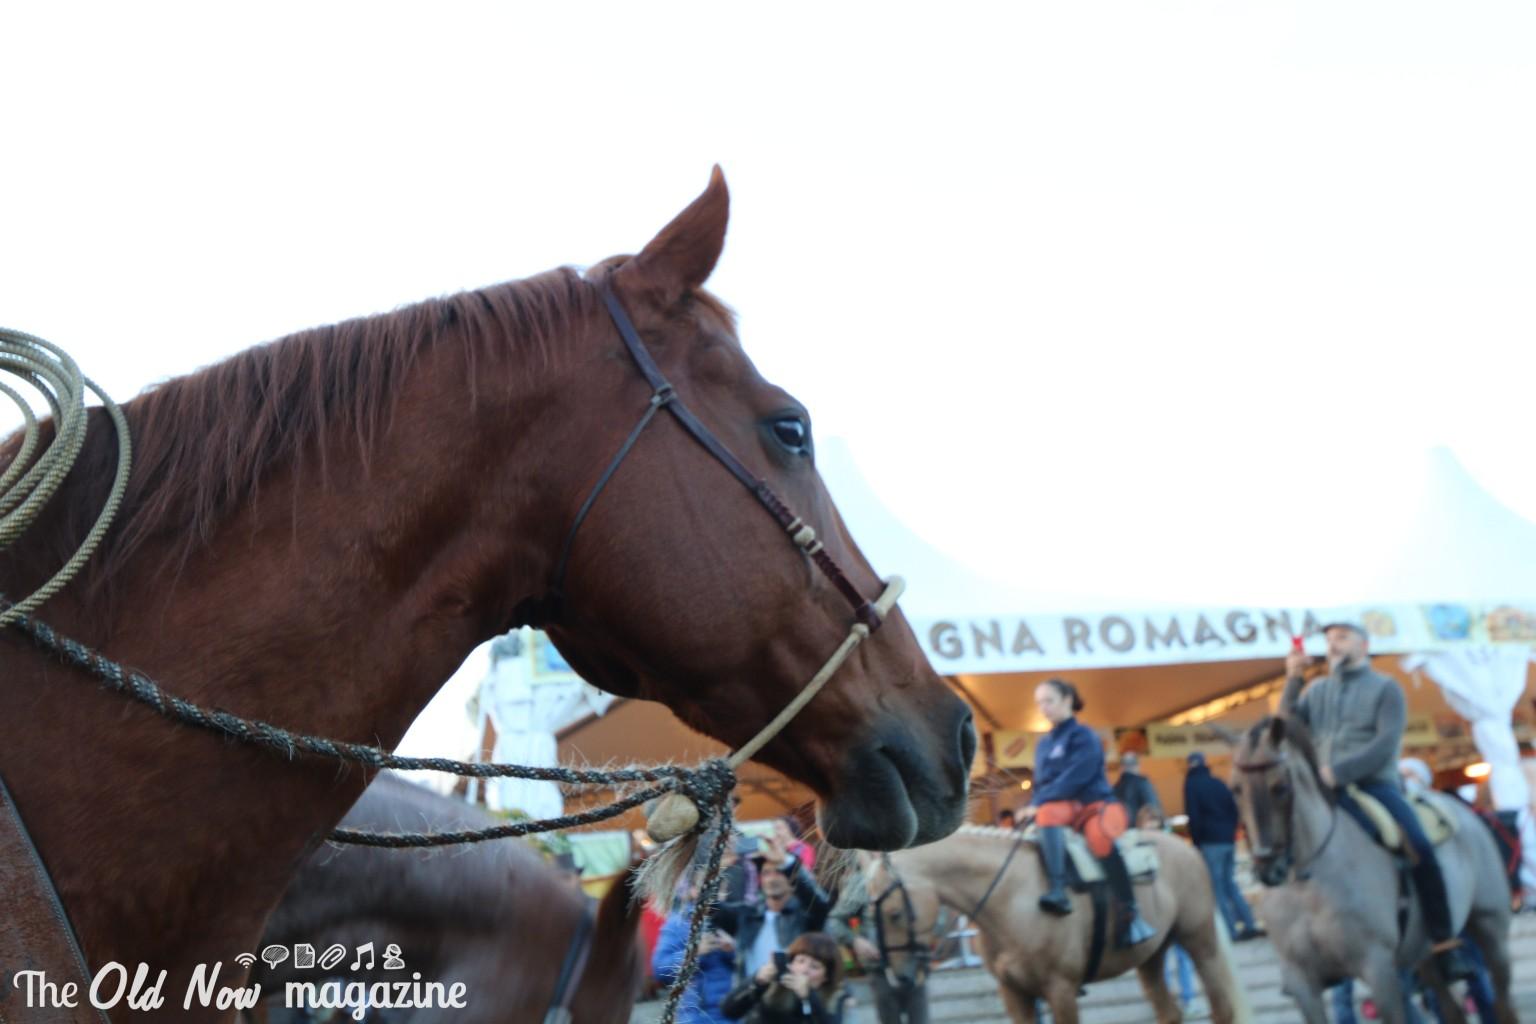 verona cavalli 2014 gmc - photo#40